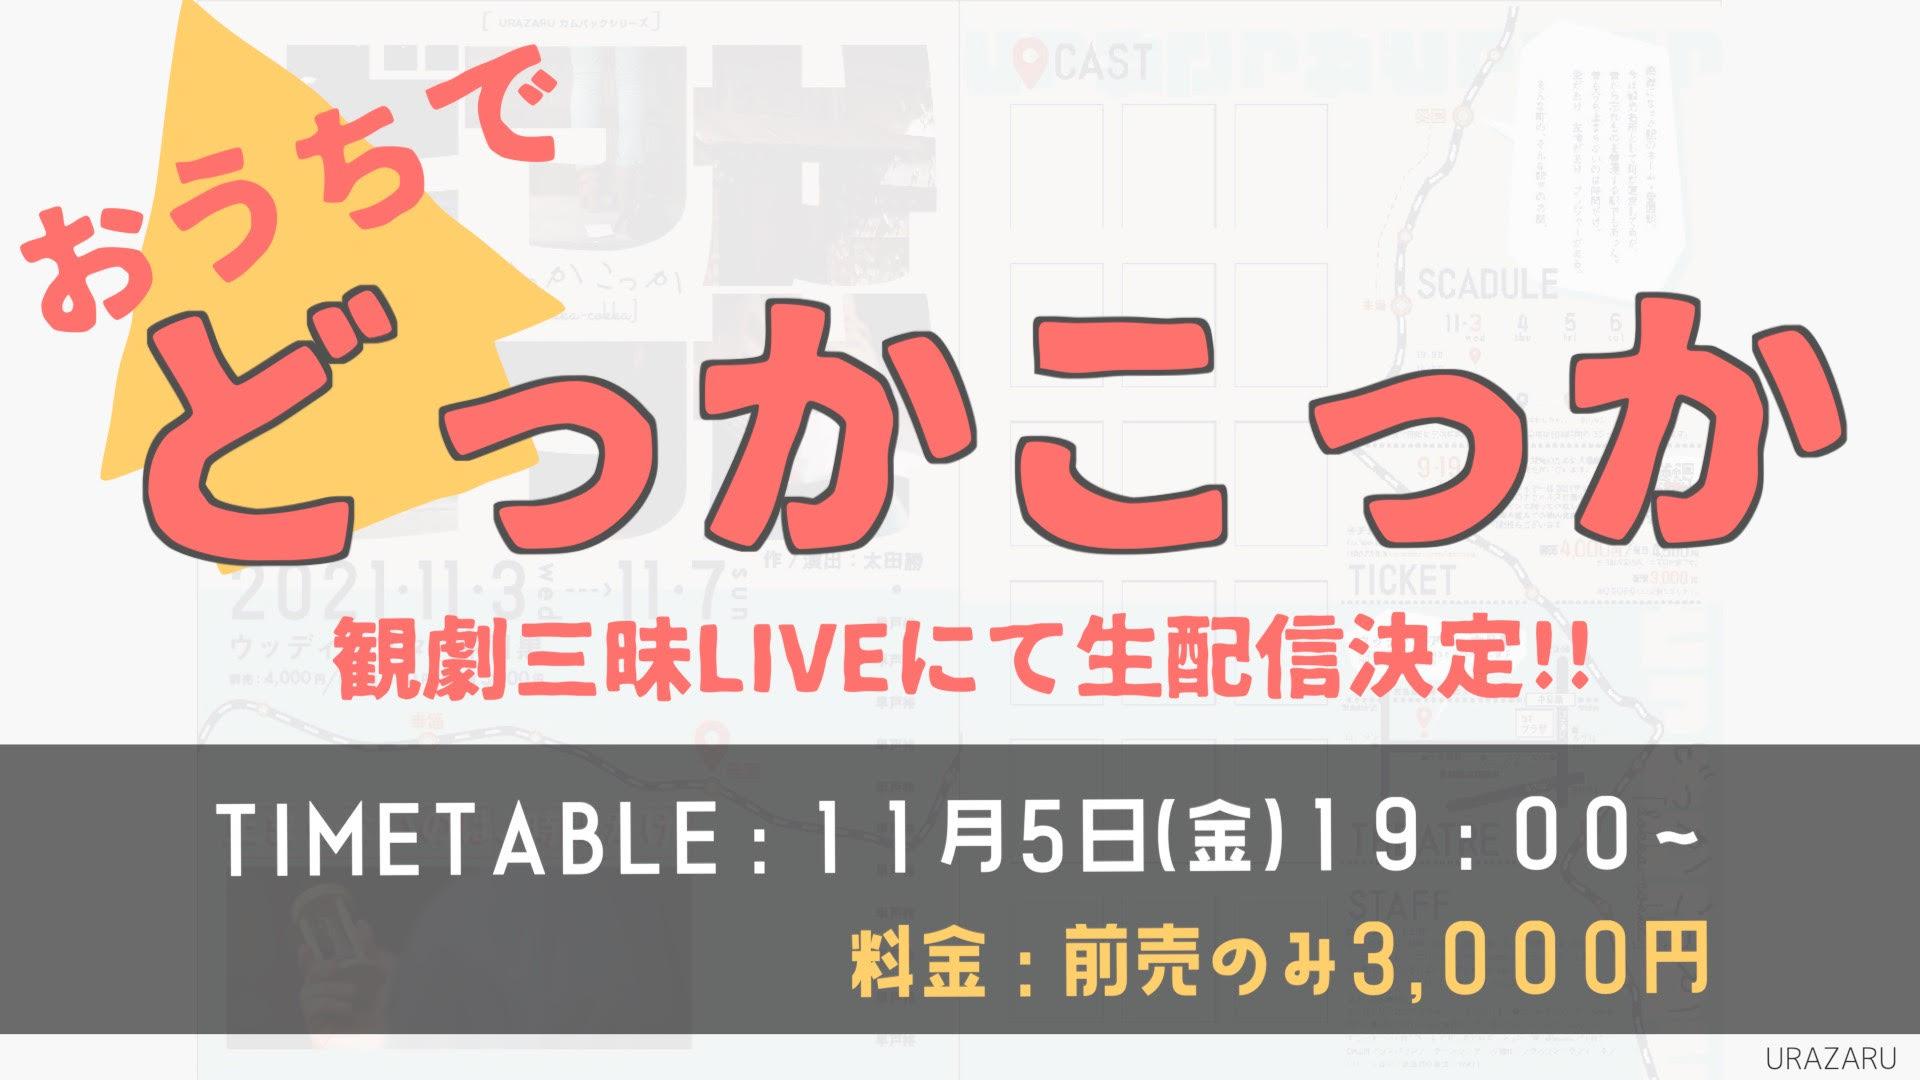 URAZARUカムバックシリーズ「どっかこっか」11/5 19:00公演